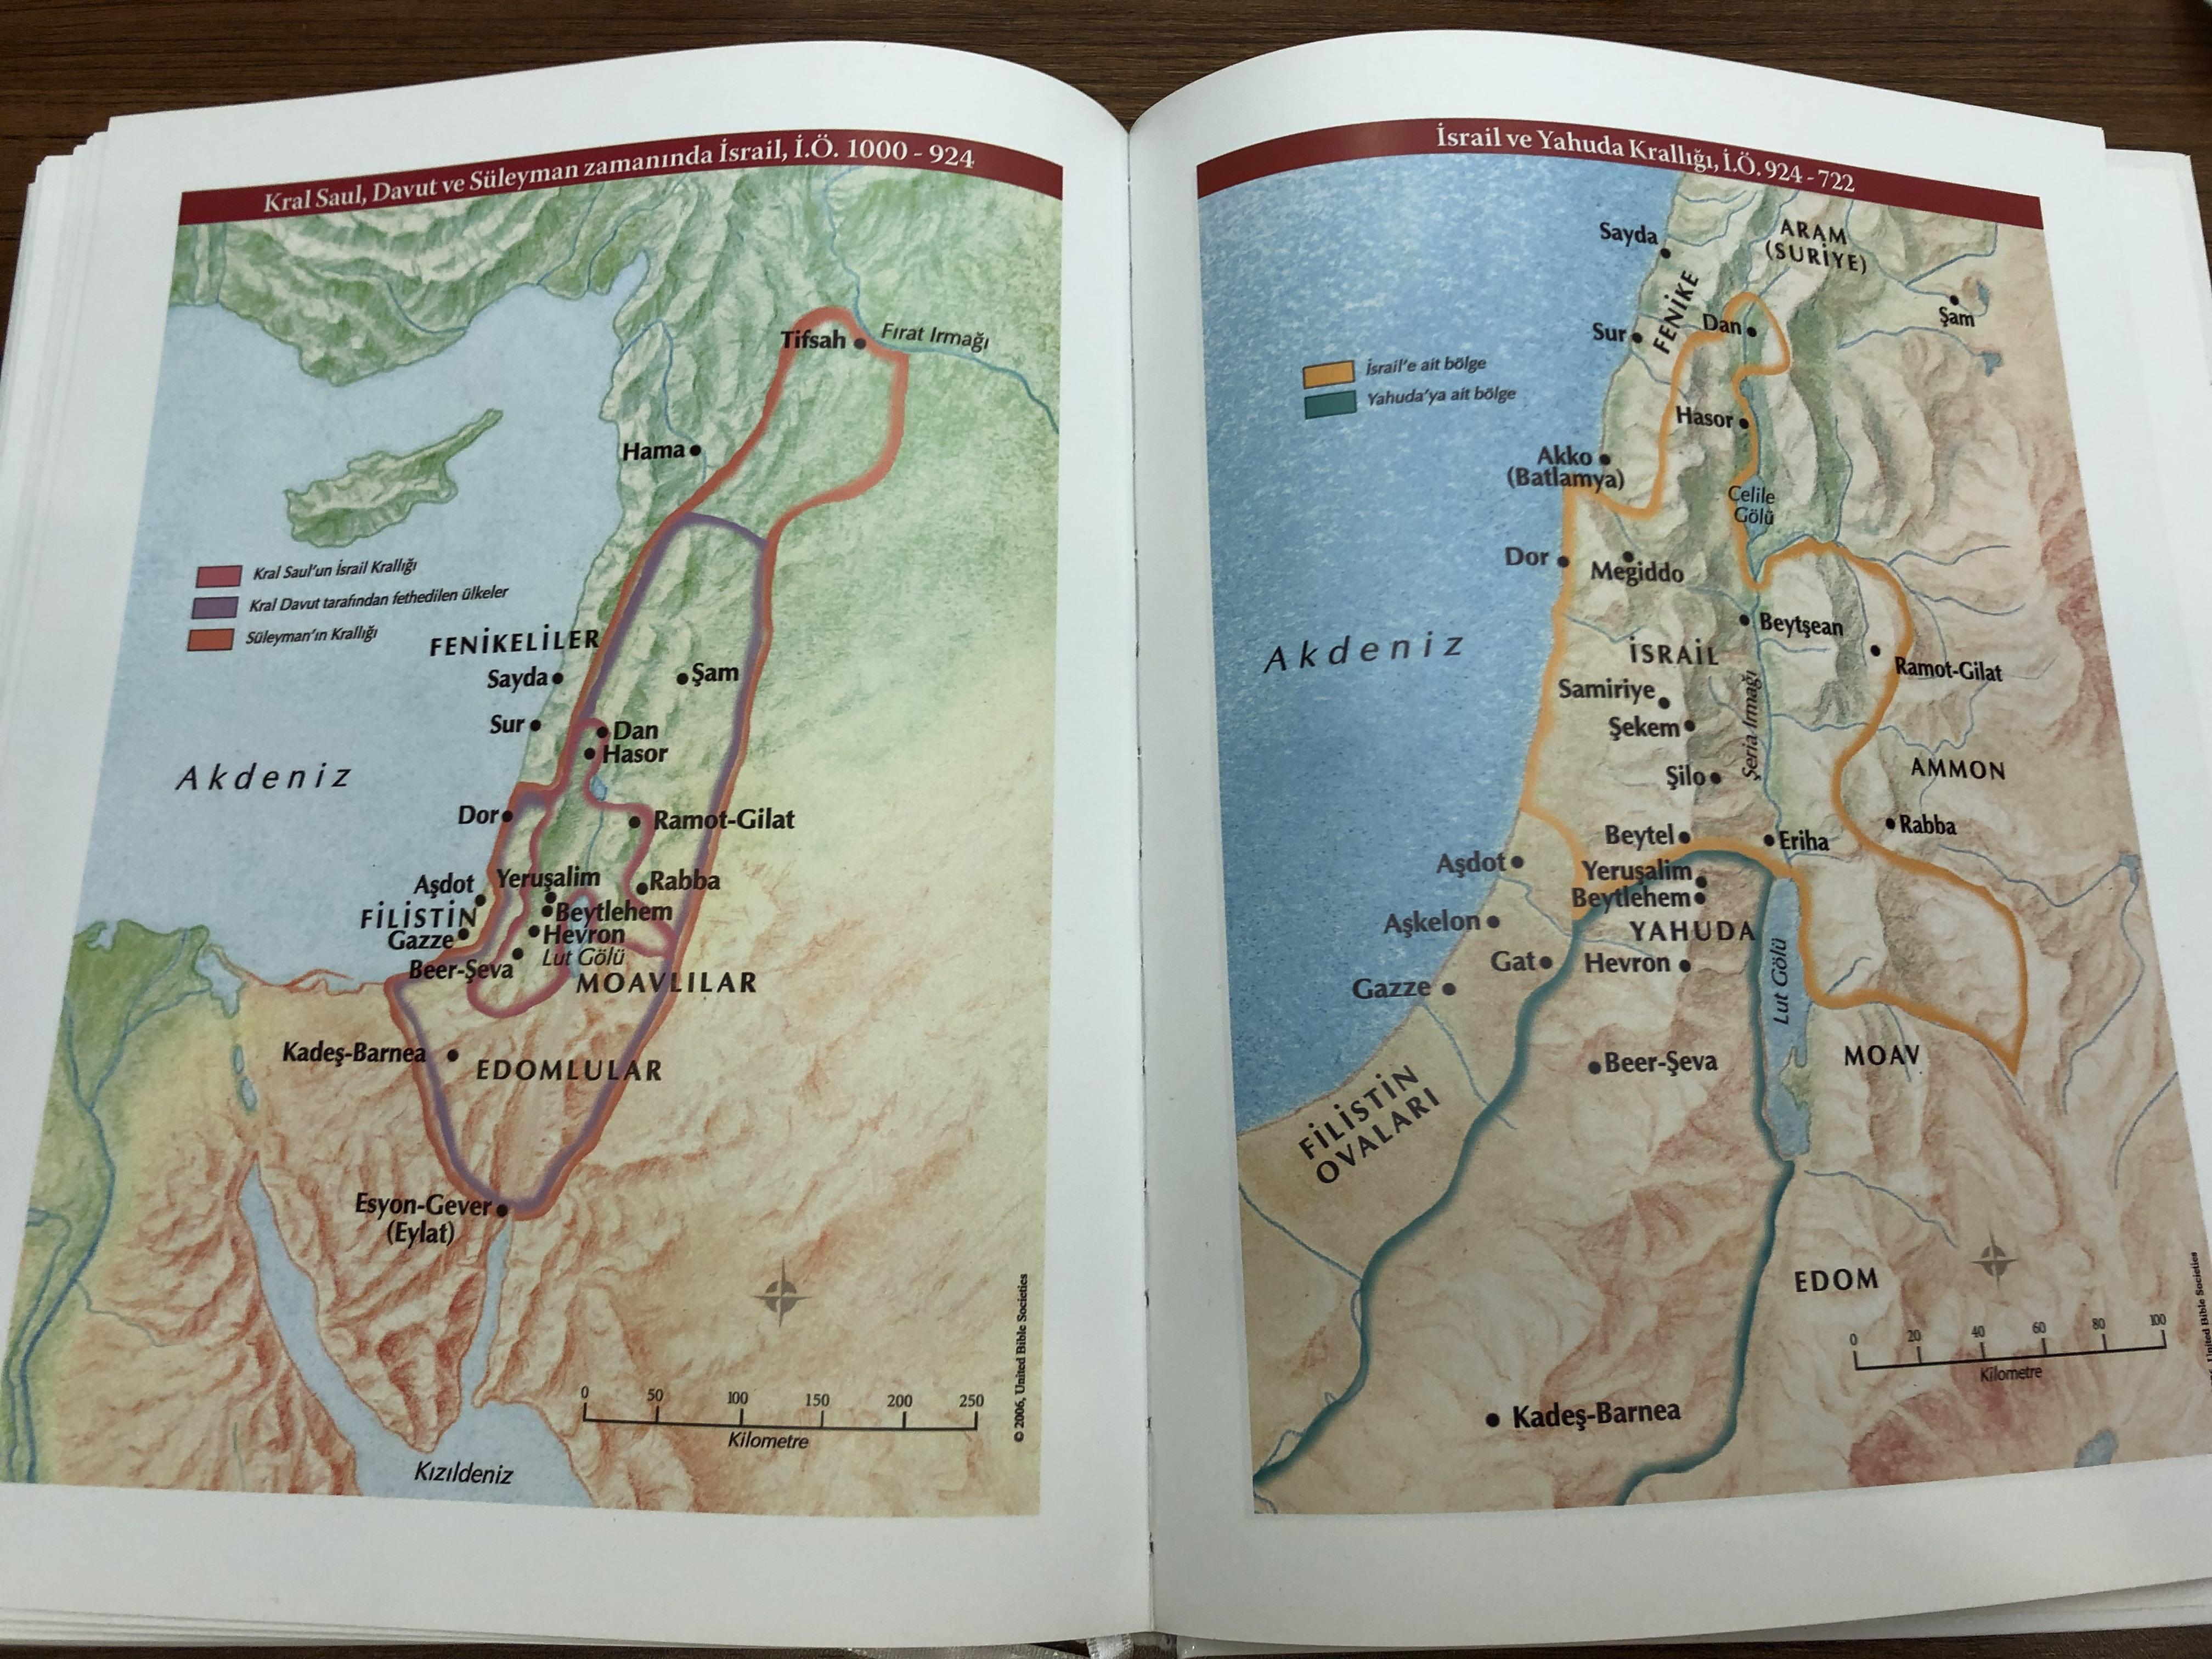 -ocuklara-kutsal-kitap-children-s-bible-reader-in-turkish-language-163-stories-from-the-bible-illustrated-in-color-hardcover-2010-15-.jpg